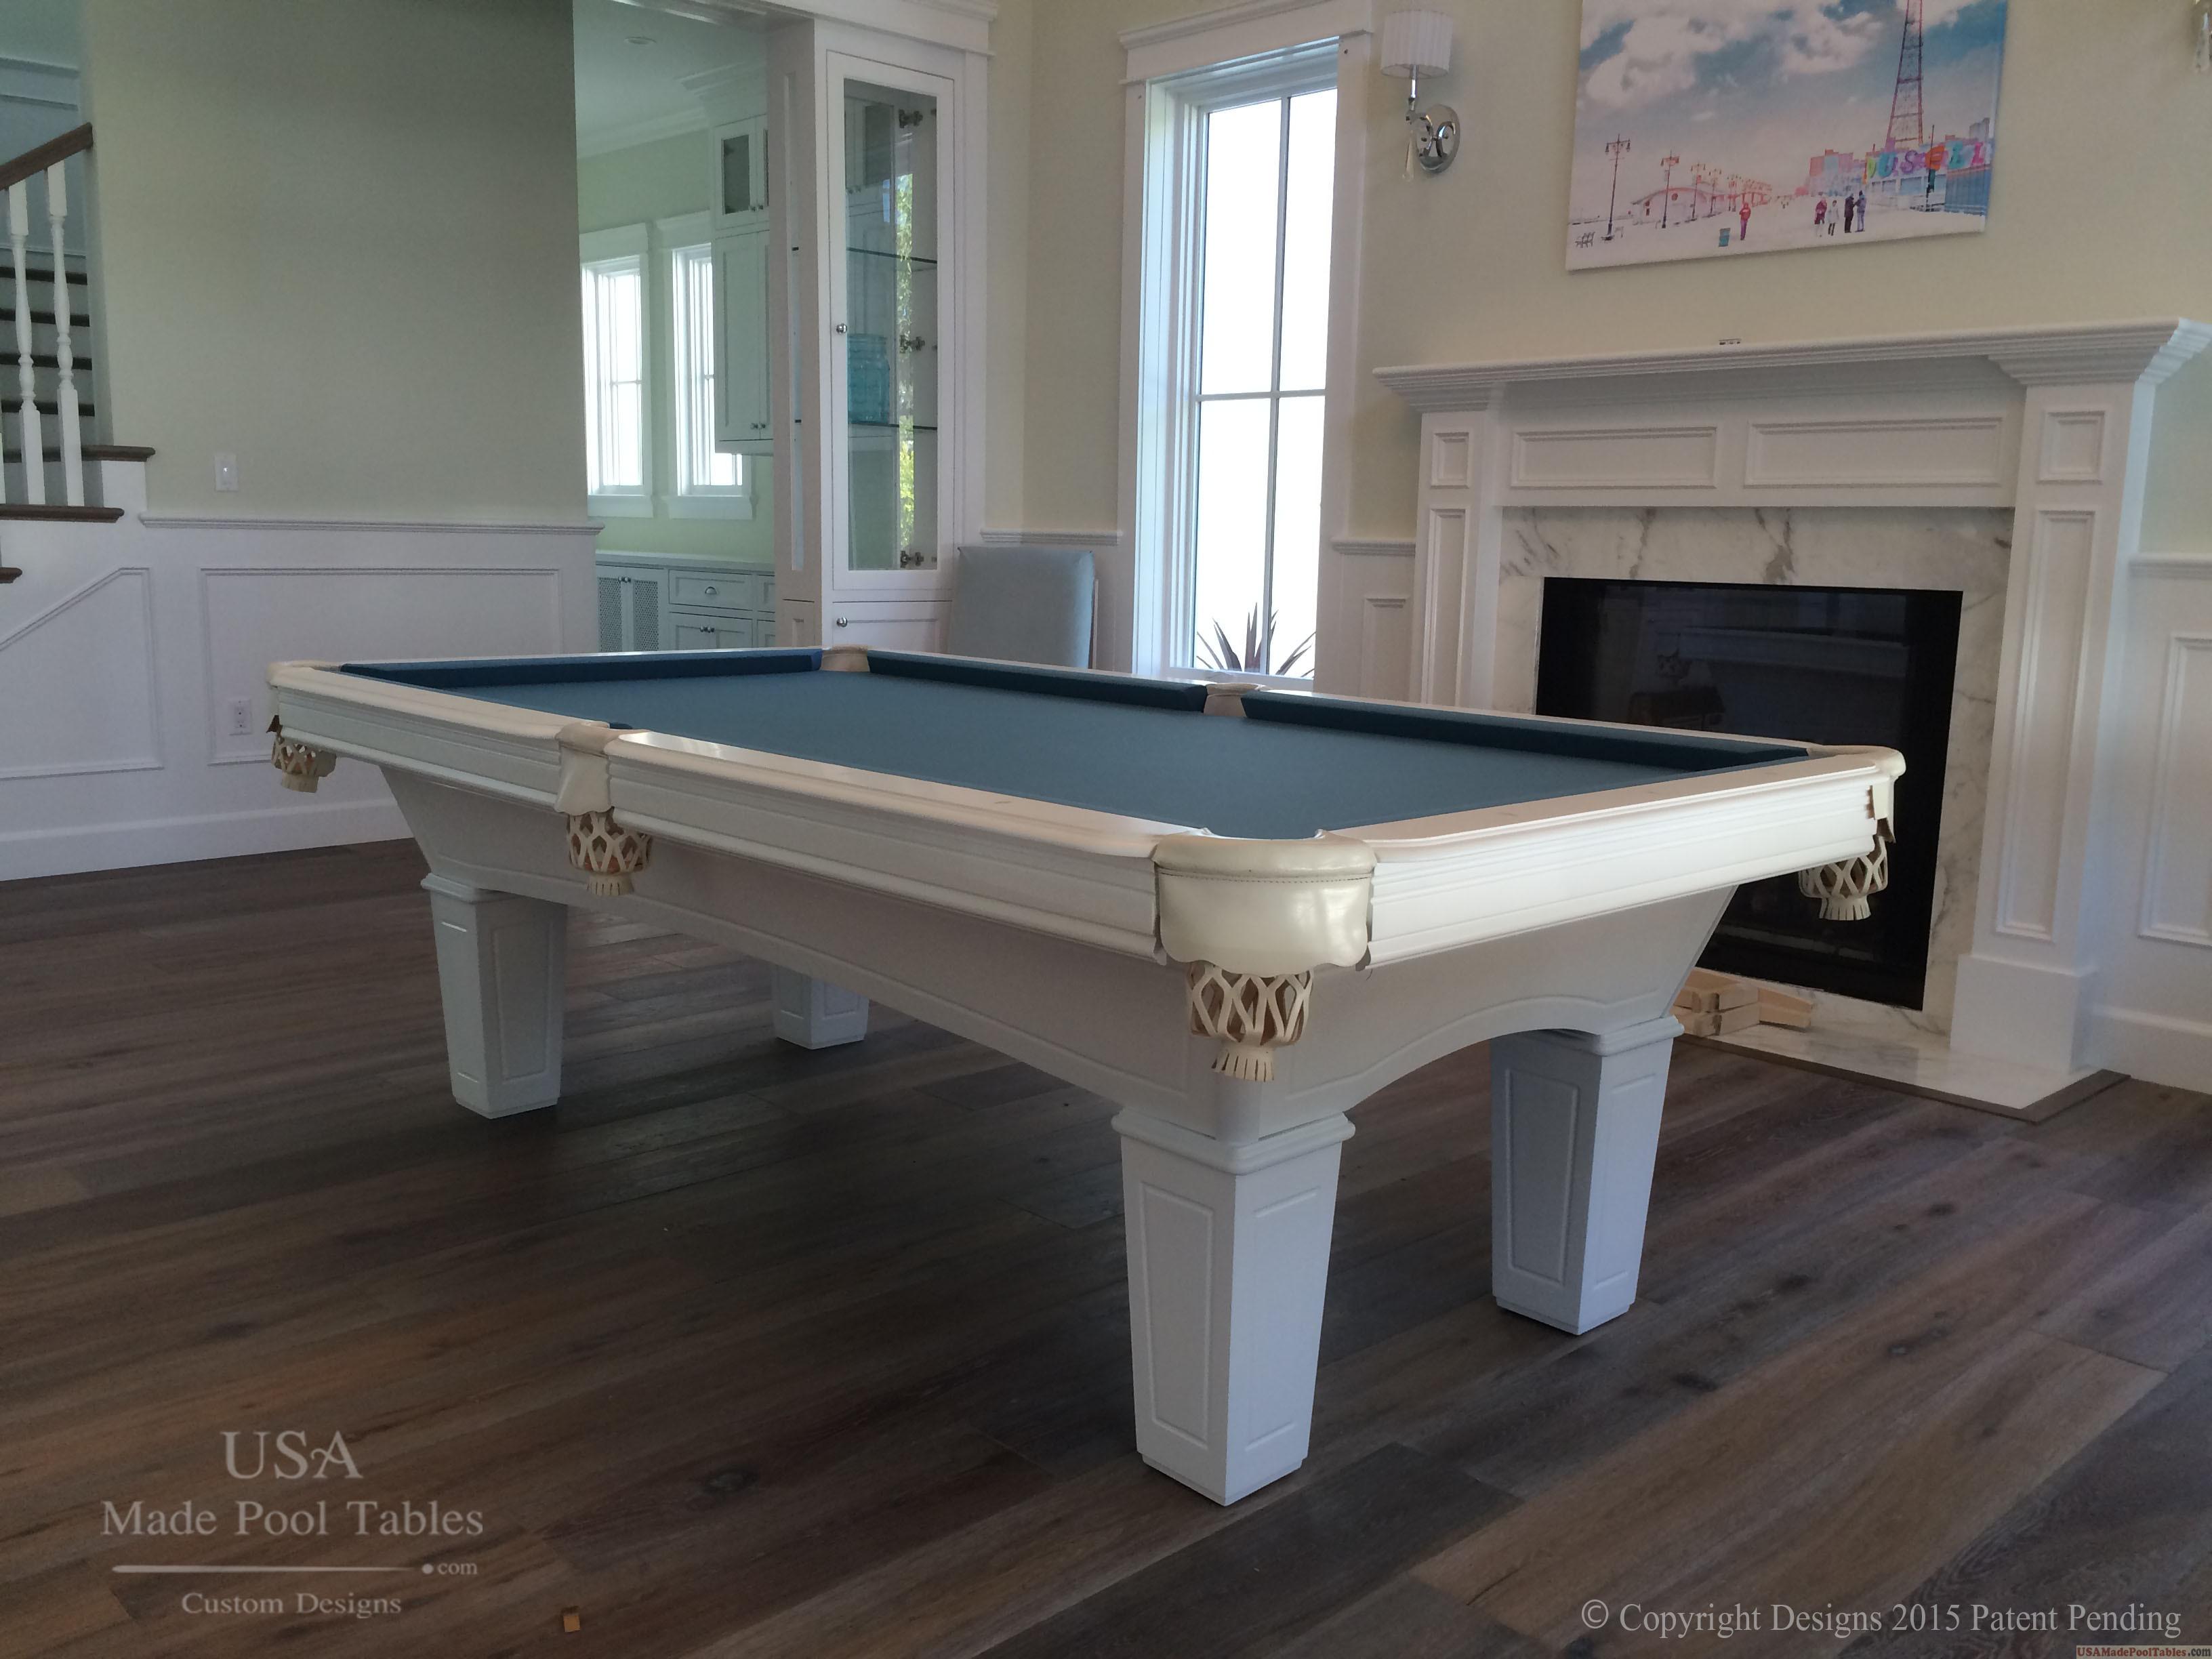 POOL TABLES POOL TABLES FOR SALE BILLIARD TABLES POOL TABLE - Bar billiards table for sale usa